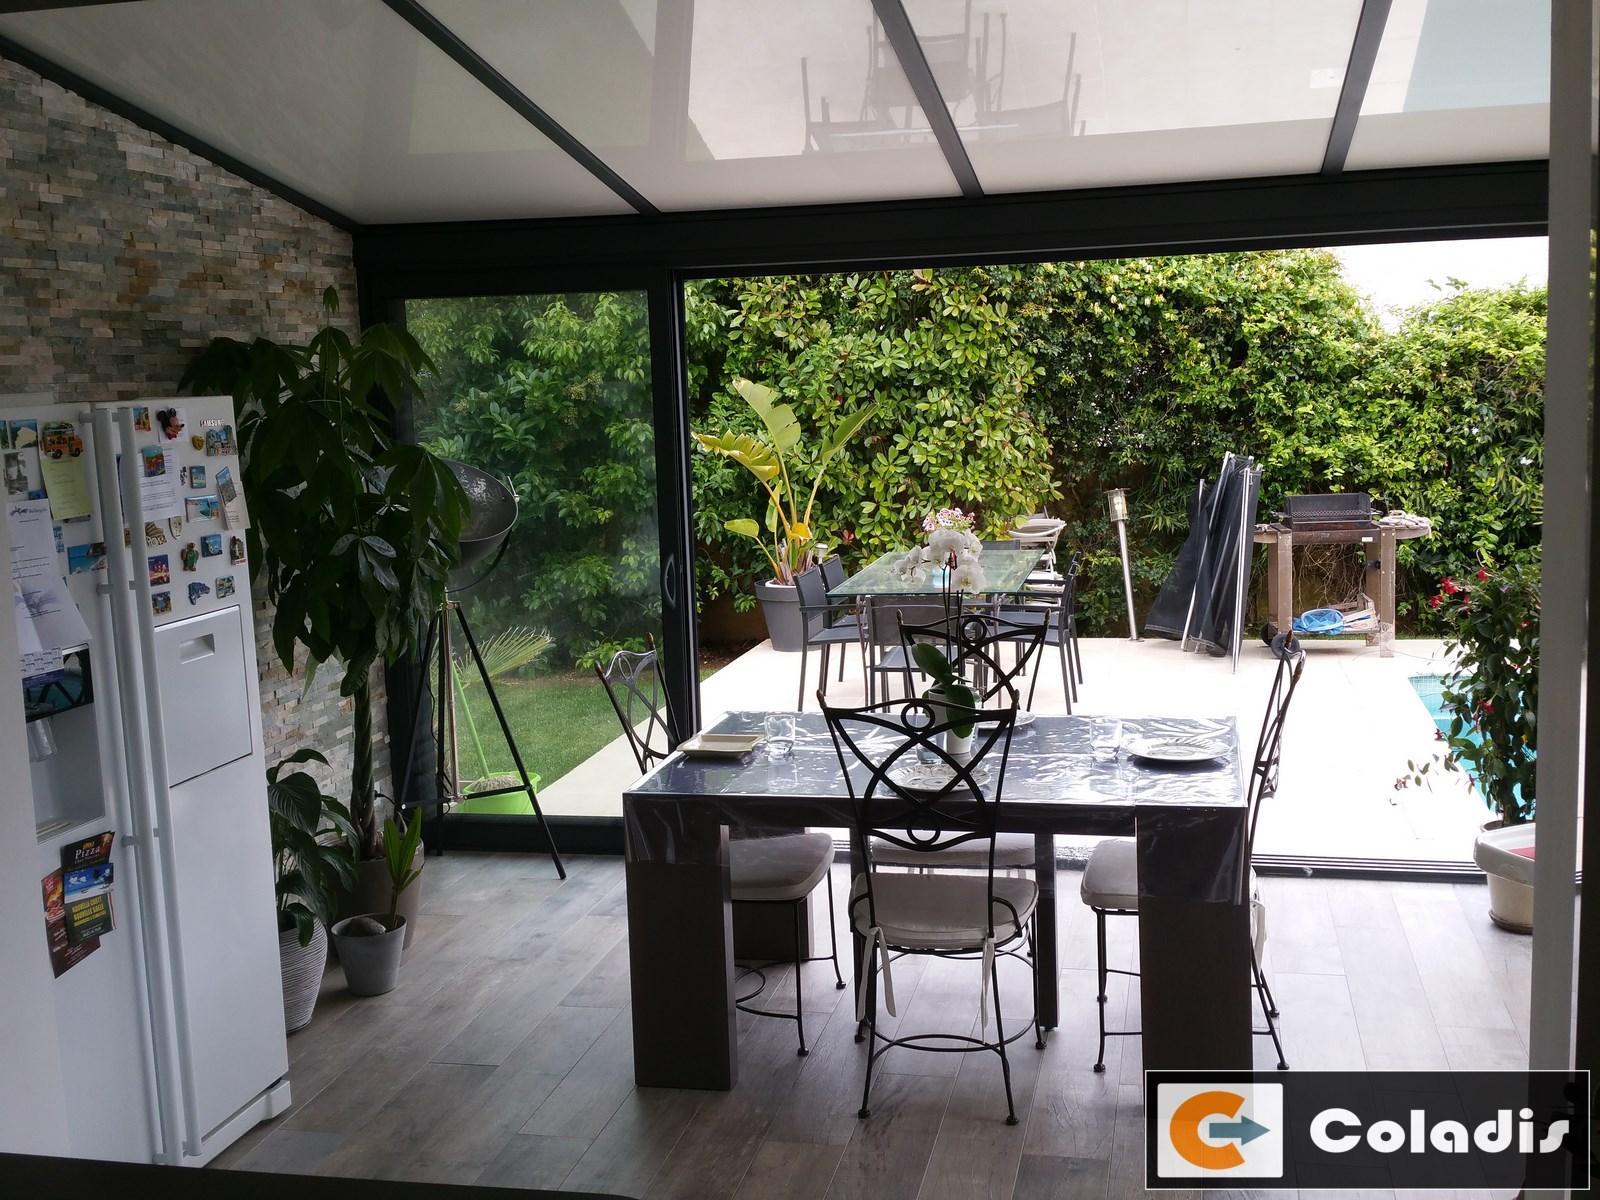 véranda alu Baillargues Hérault 34 Coladis